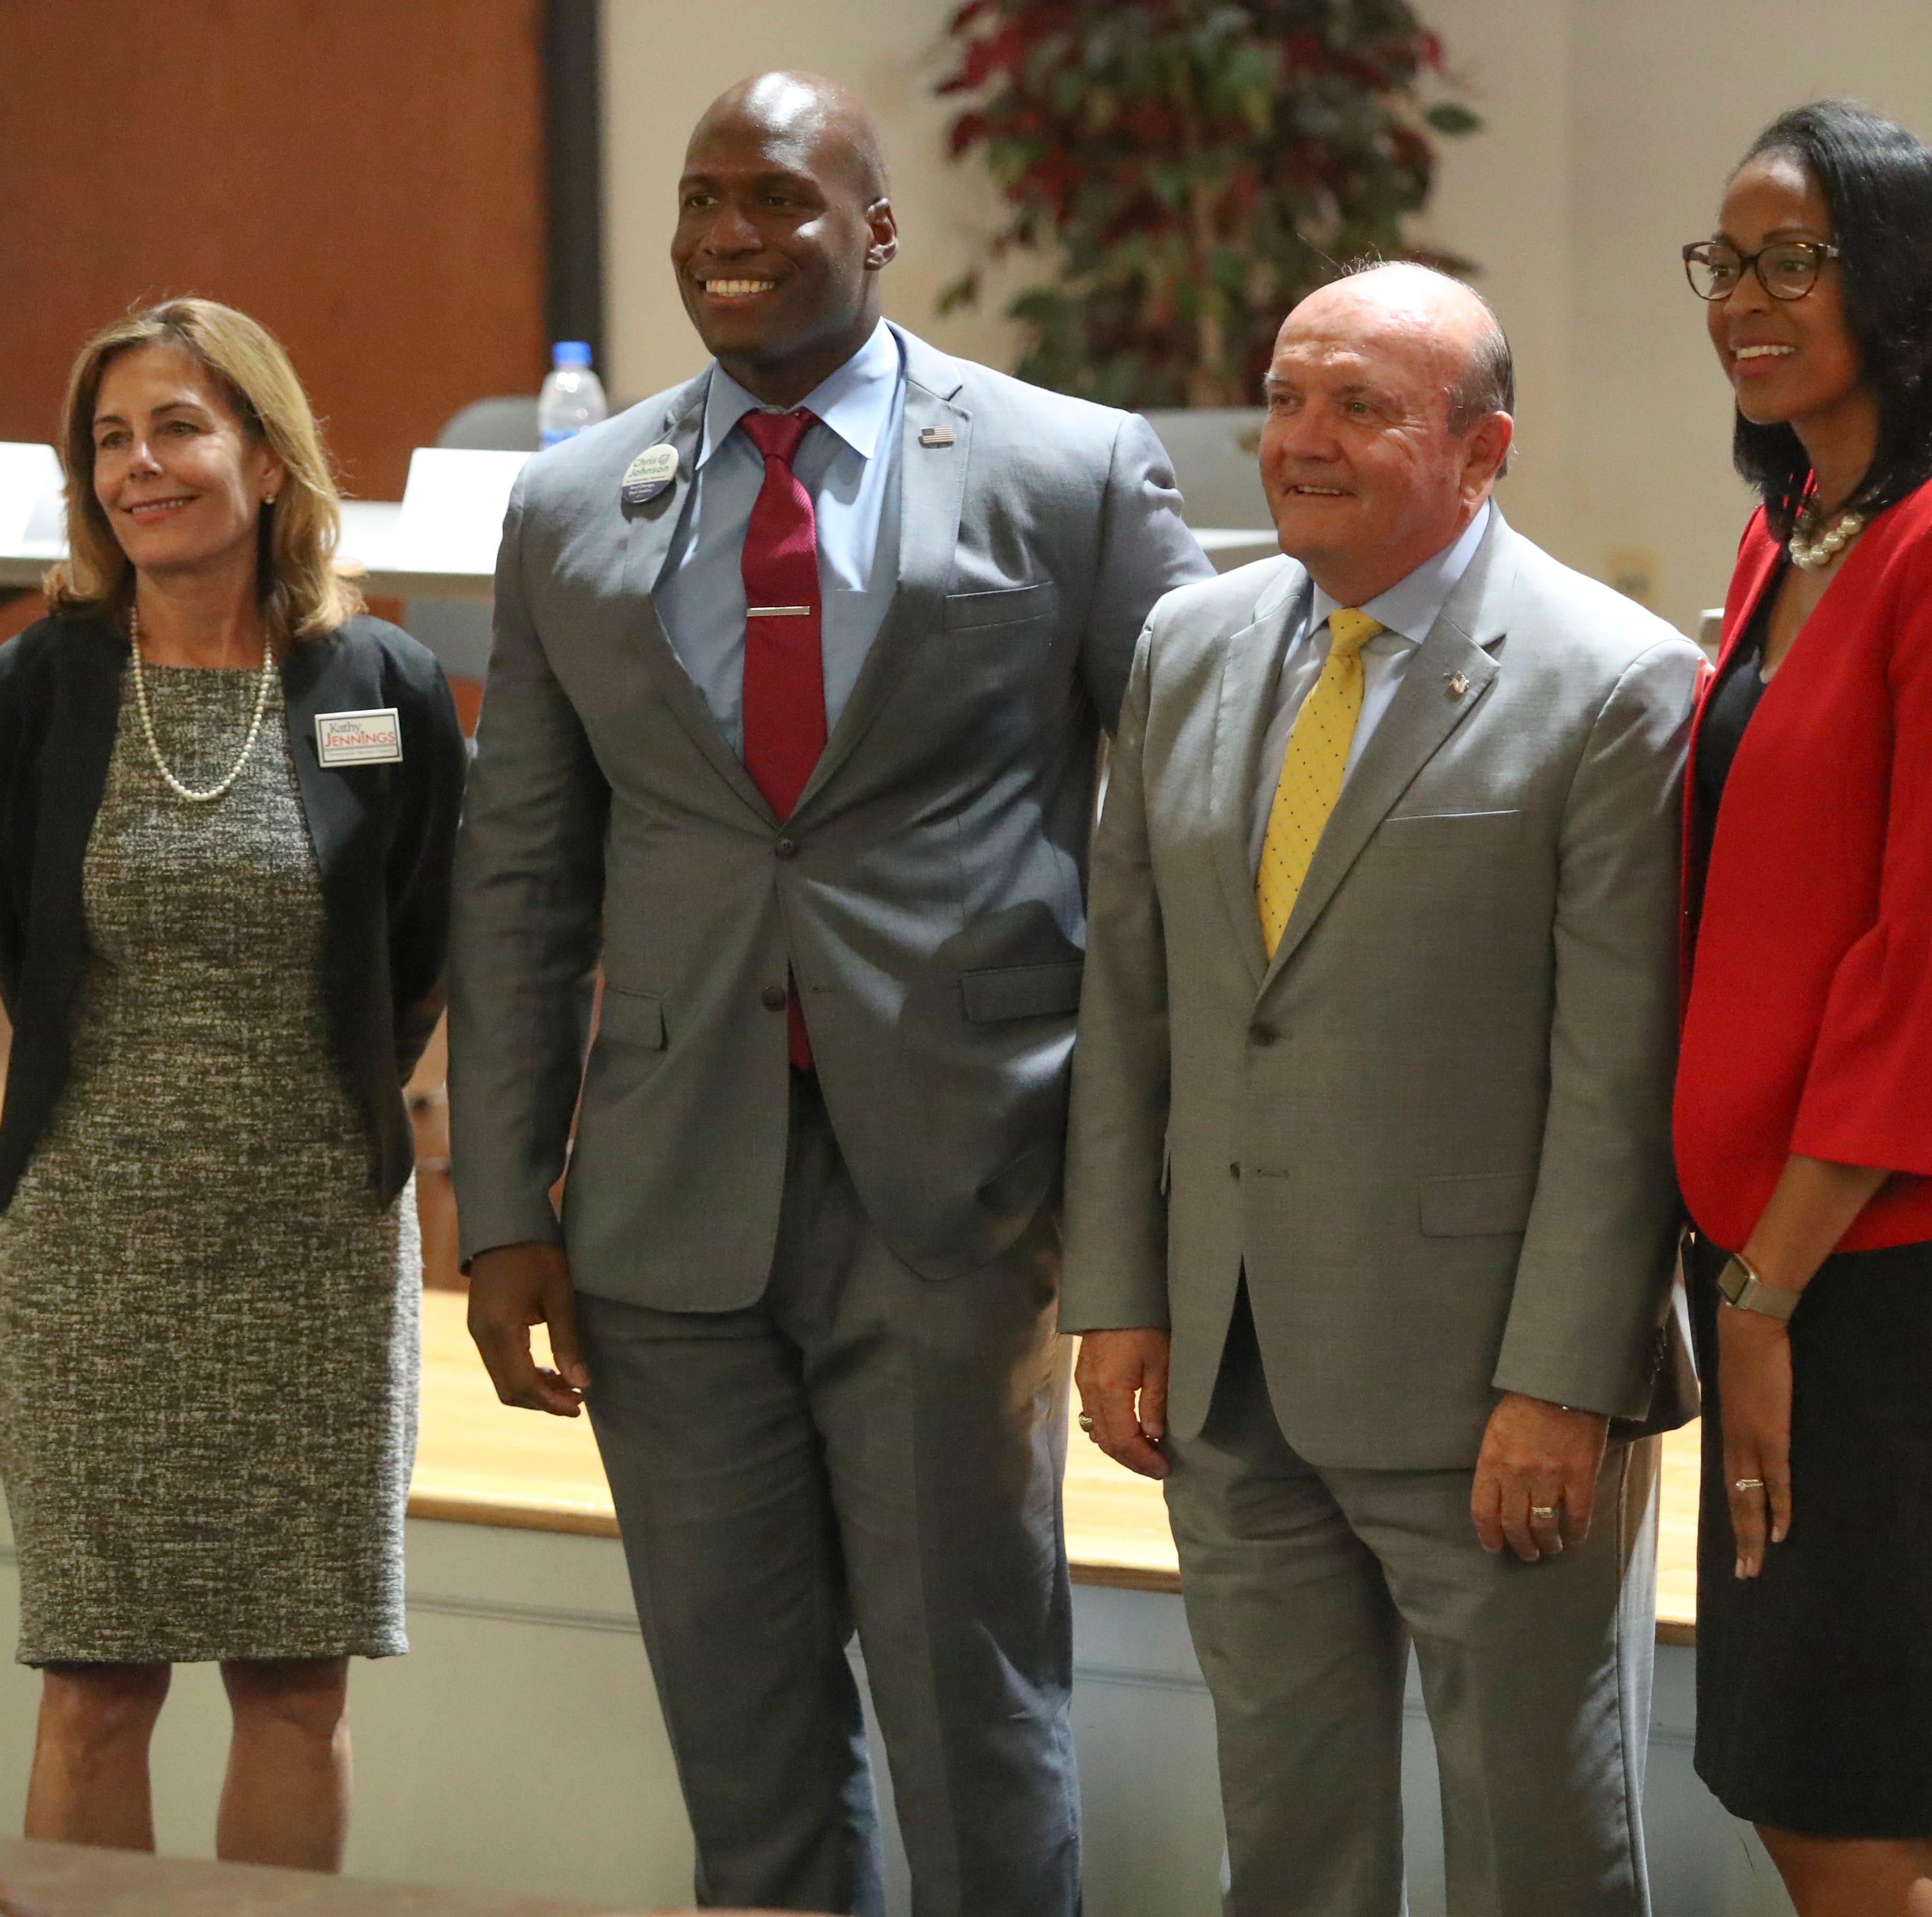 Kathy Jennings wins Democratic nod for Delaware attorney general